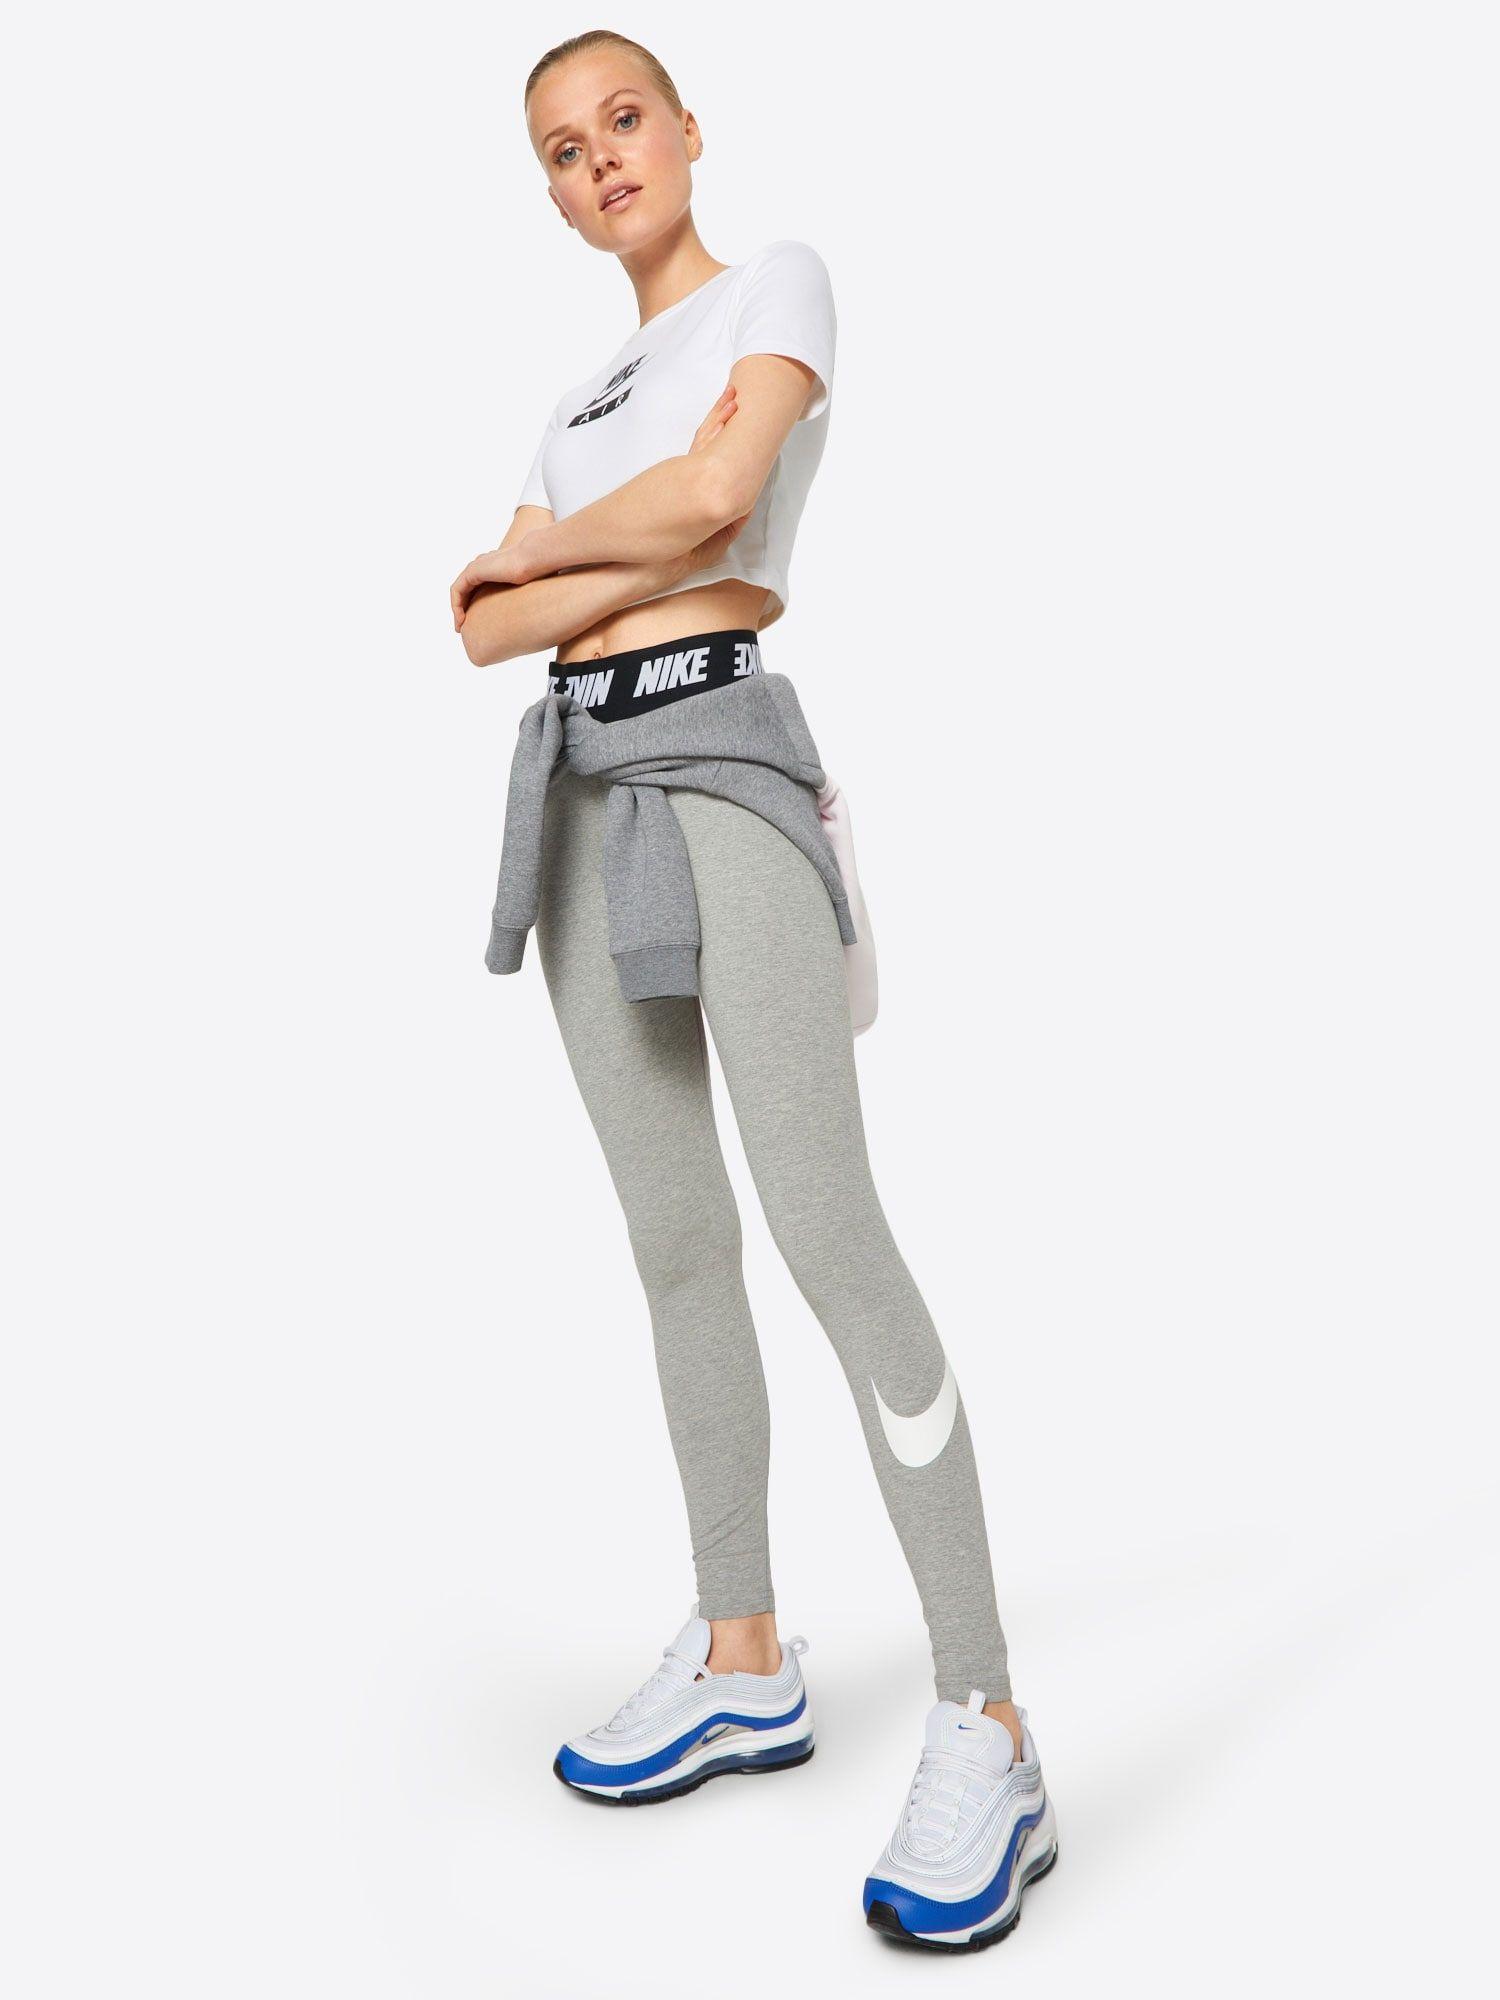 Nike Sportswear Jogginghose In Grau About You In 2020 Jogginghose Damen Jogginghose Nike Sportswear